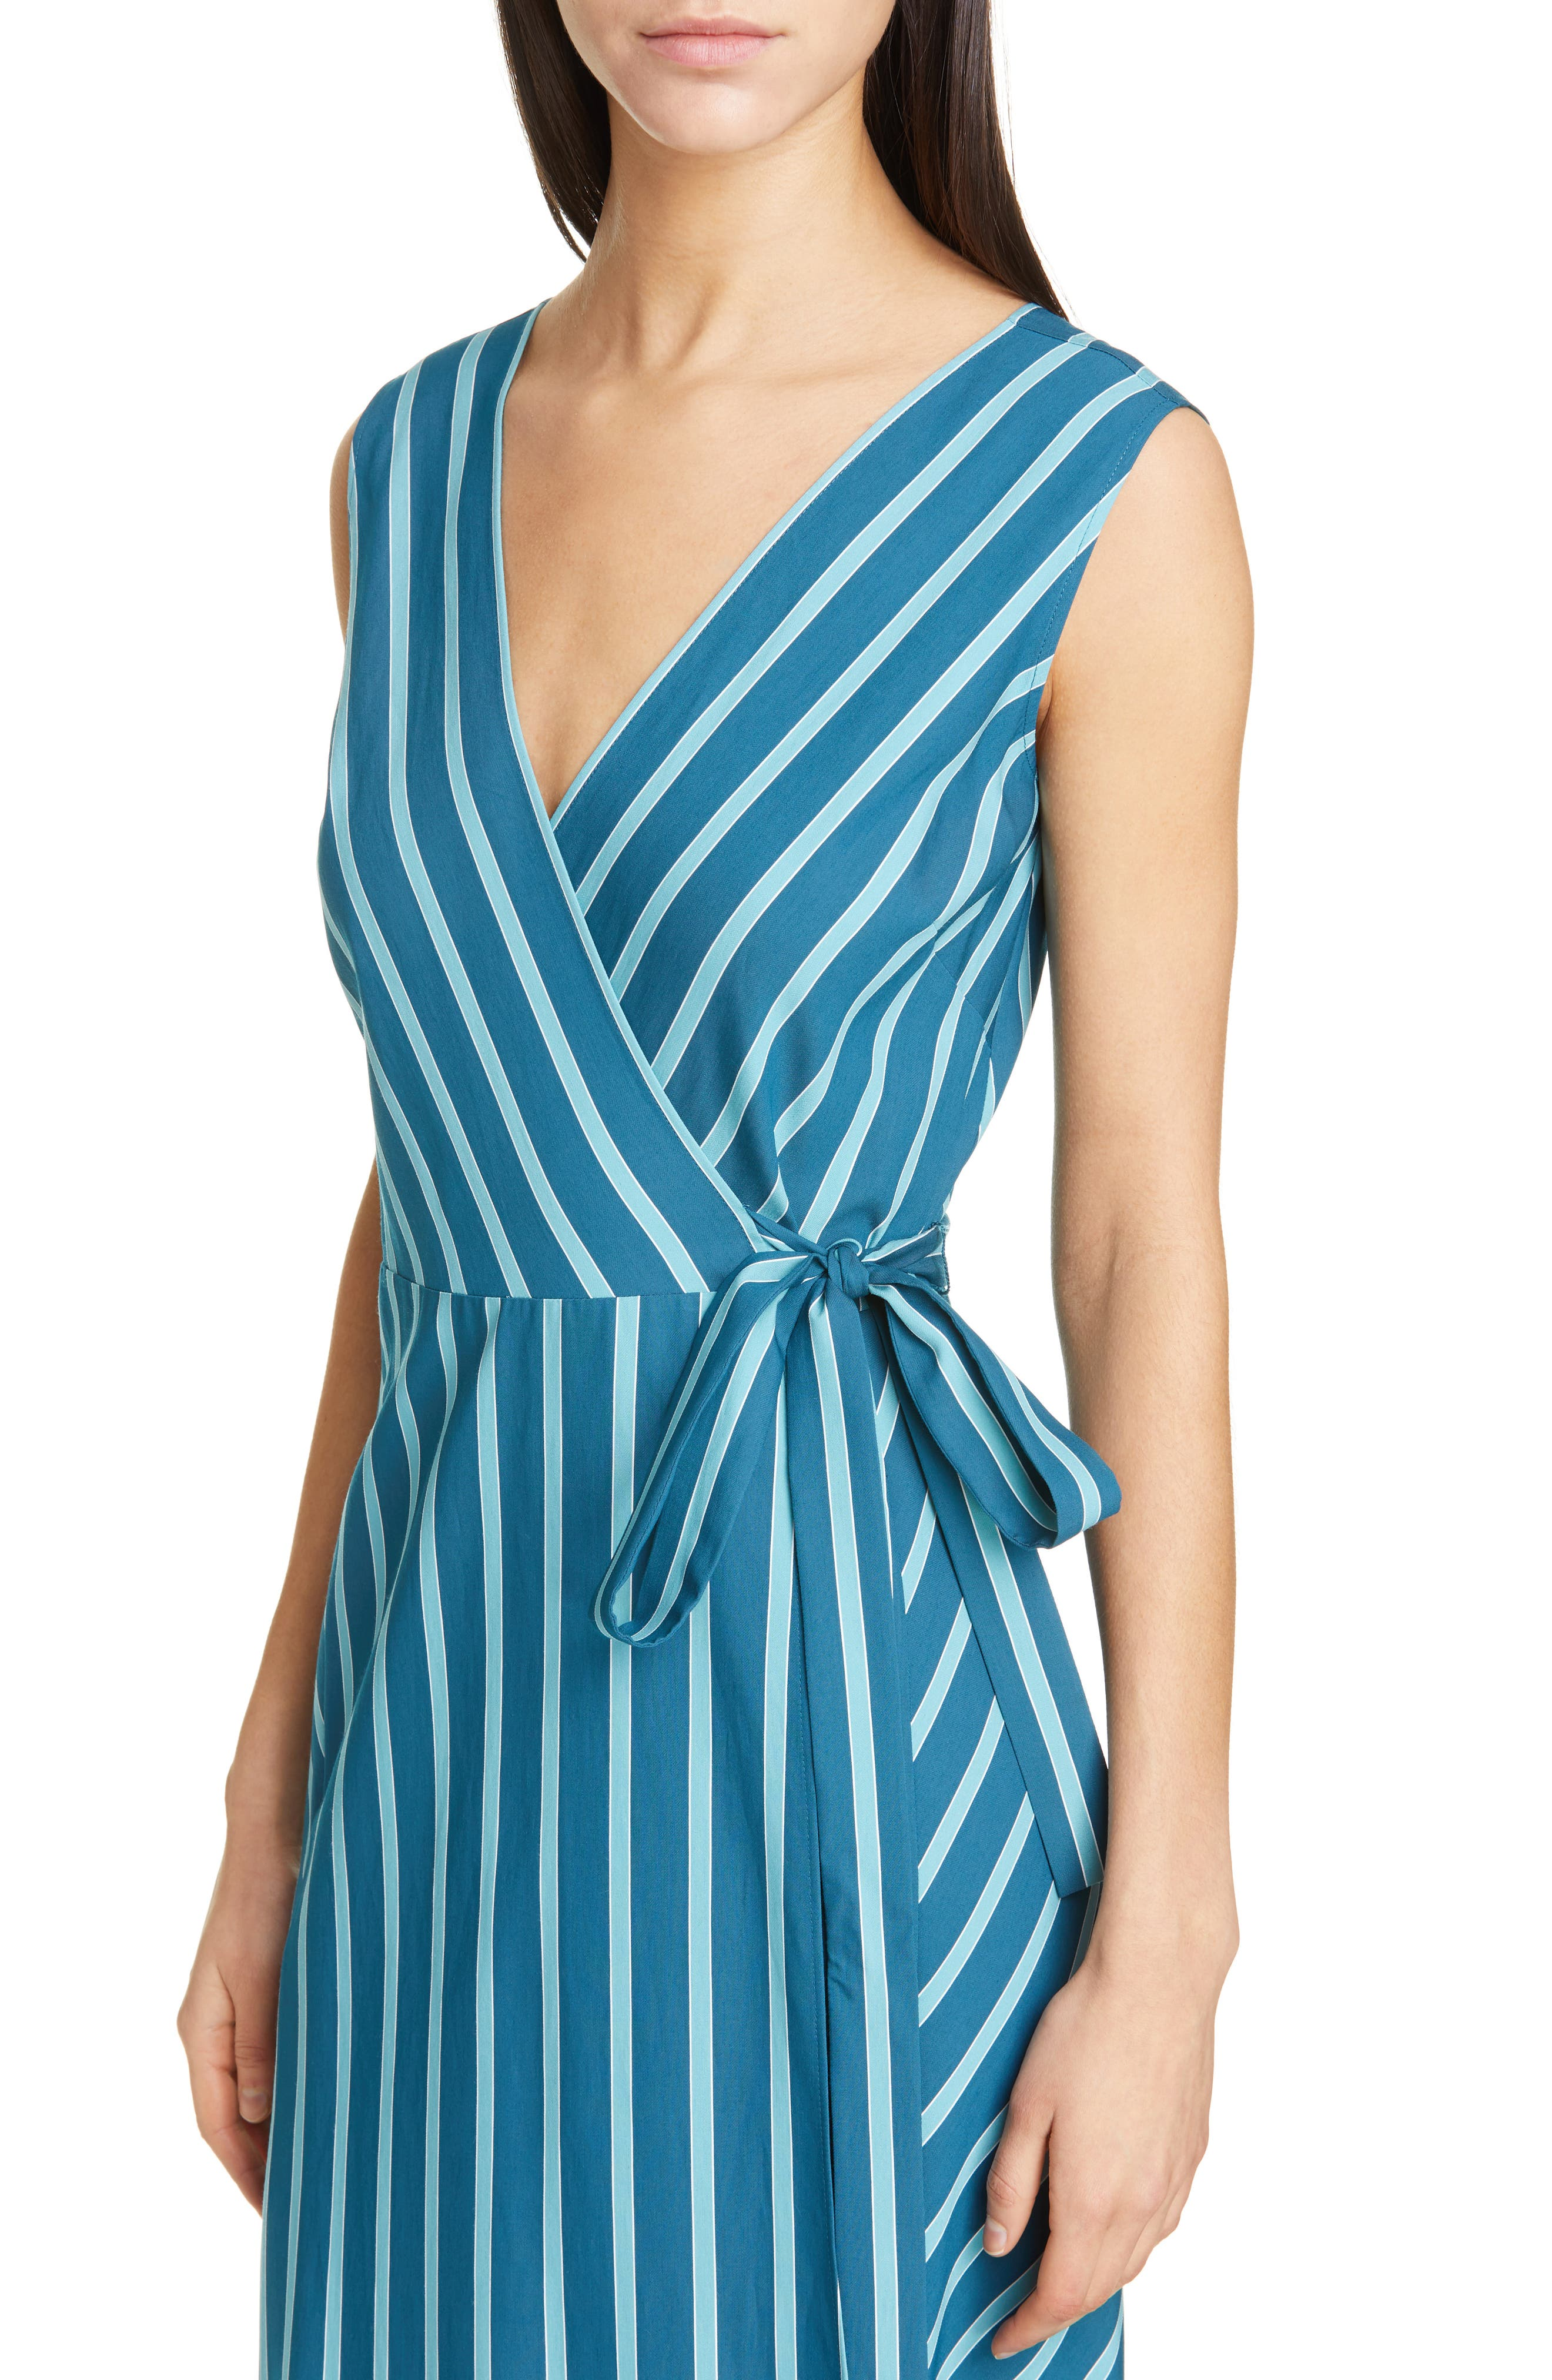 LAFAYETTE 148 NEW YORK, Siri Wrap Dress, Alternate thumbnail 5, color, PACIFIC MULTI